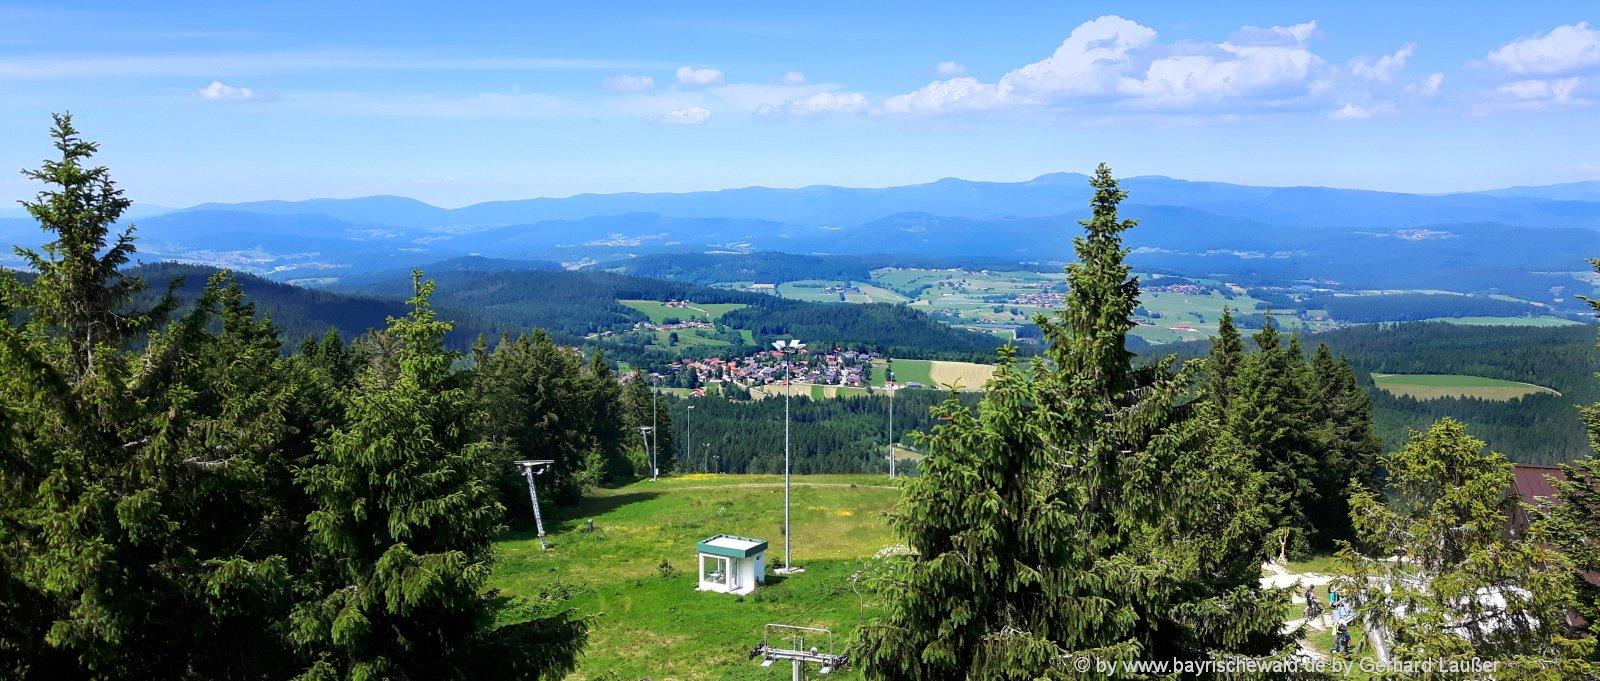 ausflugsziele-bayerischer-wald-geisskopf-bergwandern-aussichtspunkt